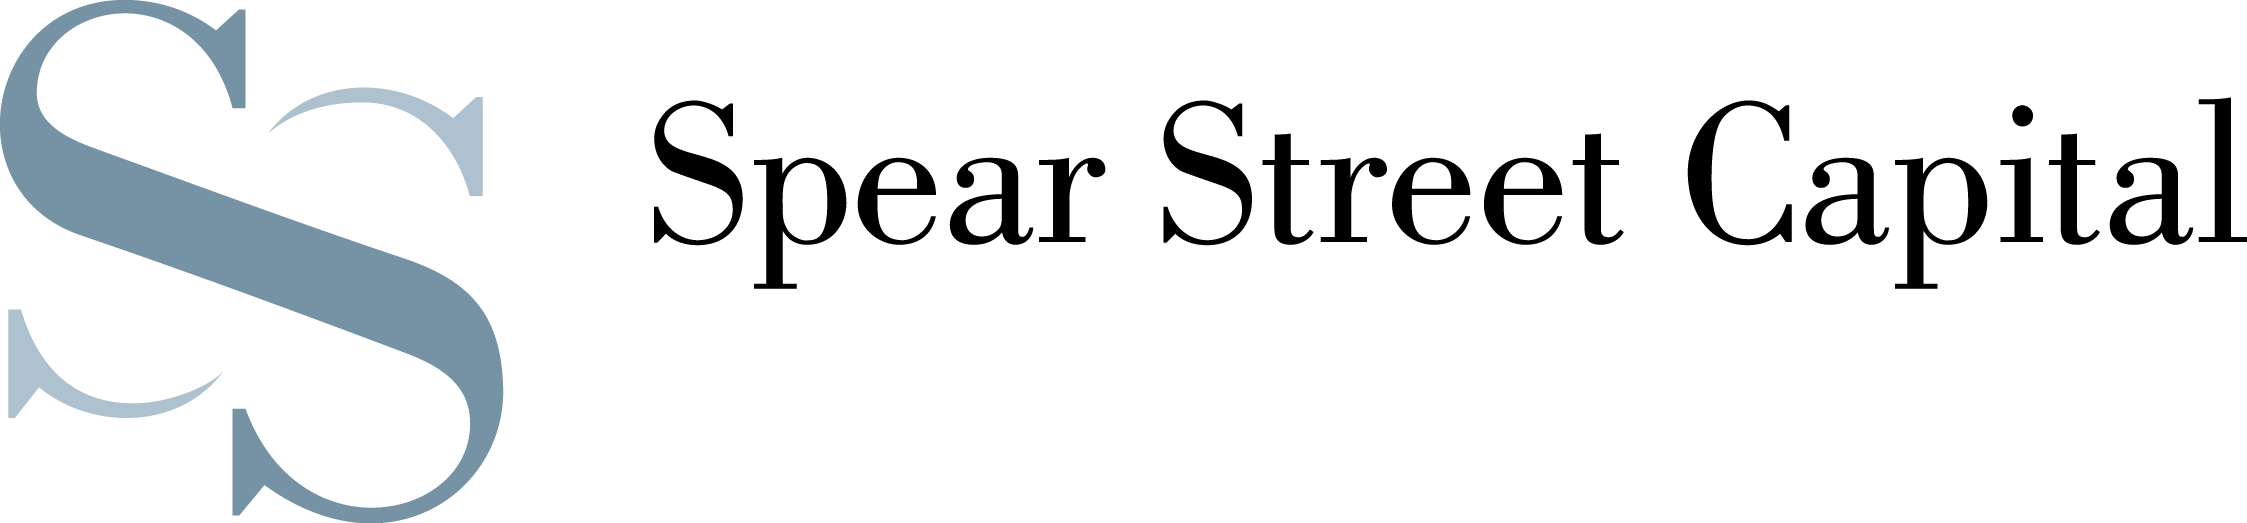 Spear Street Capital